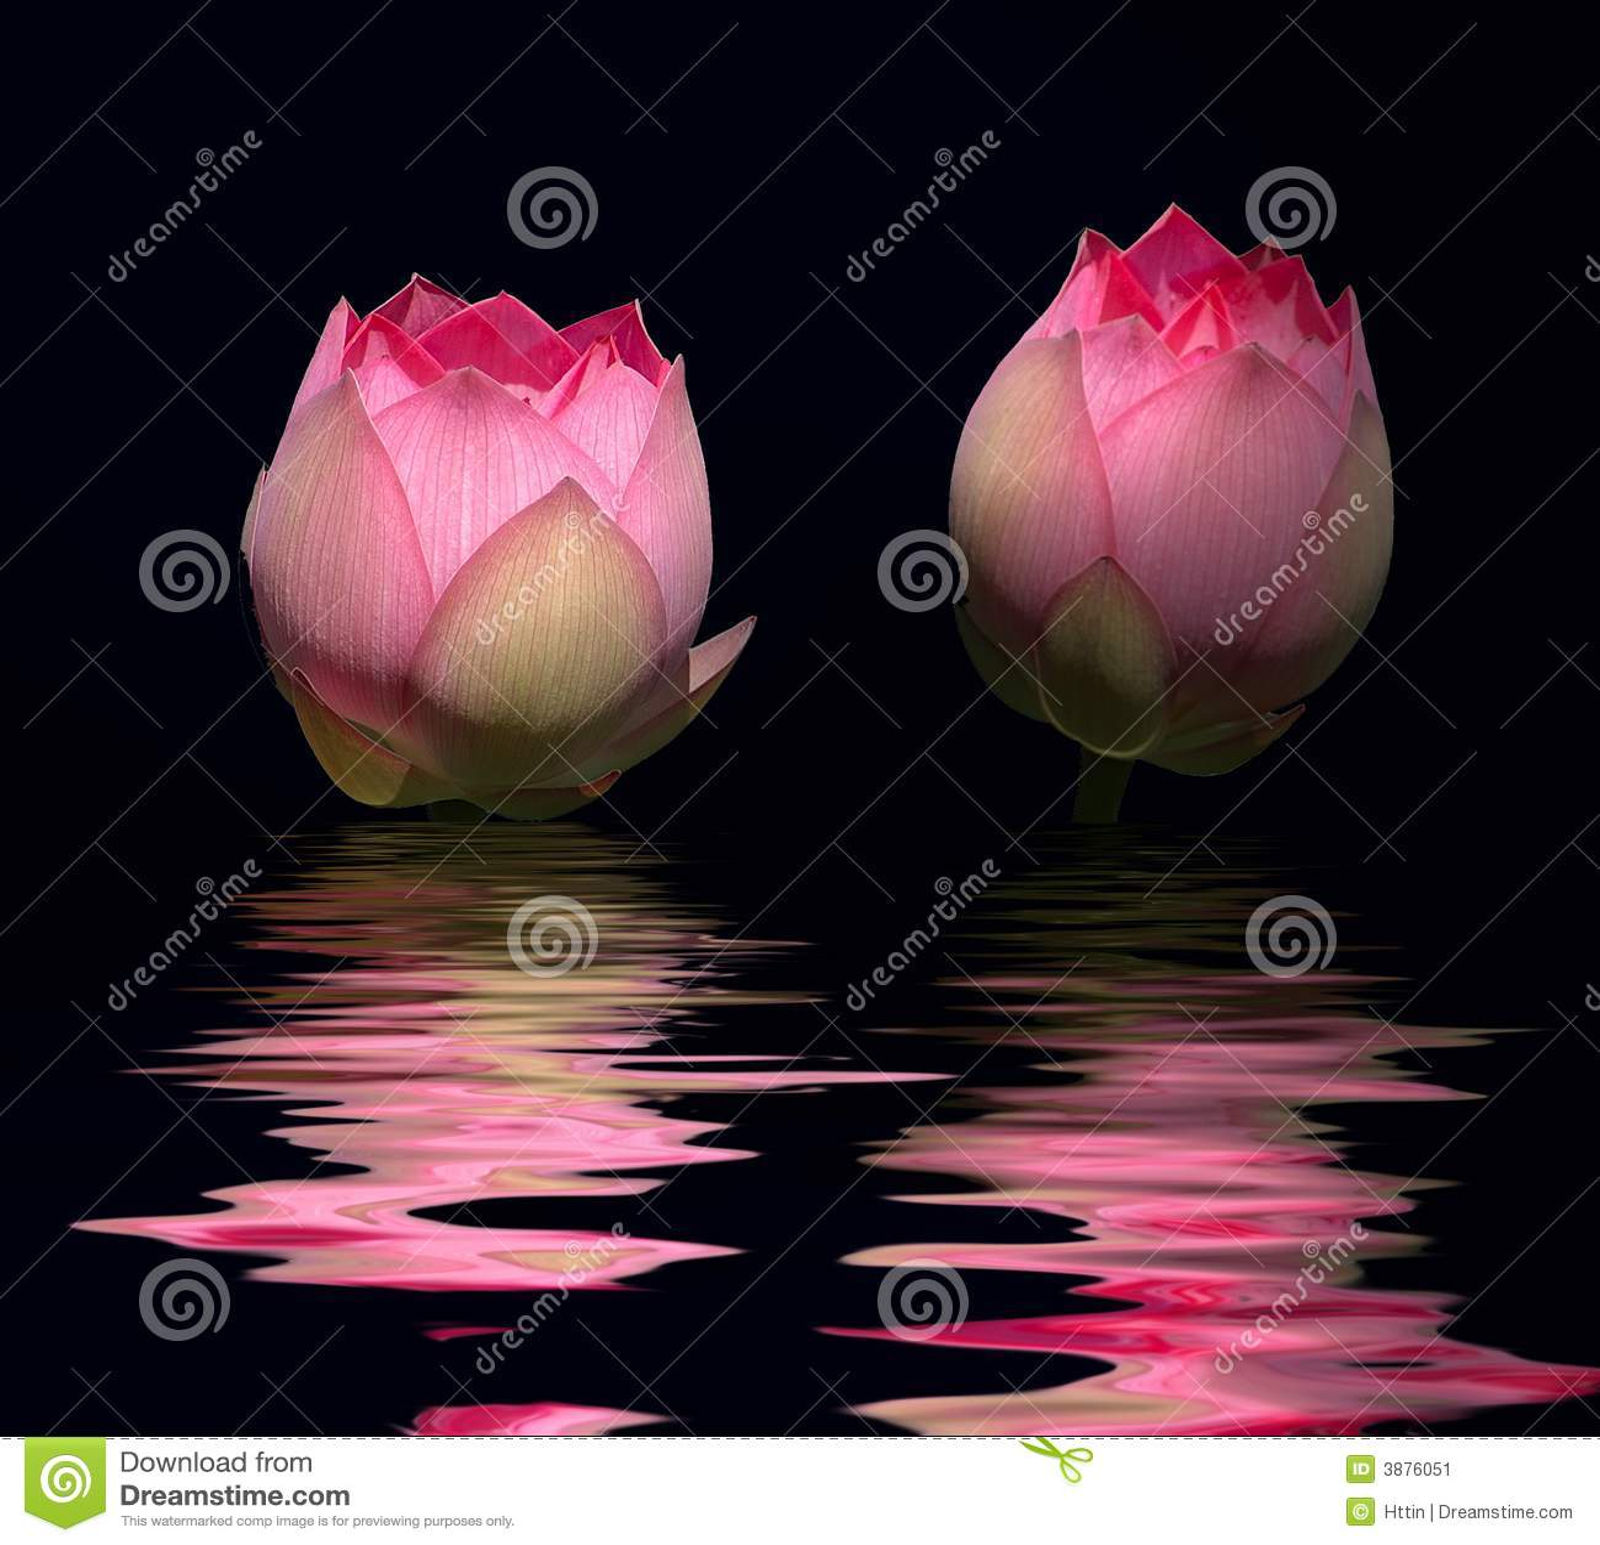 Red lotus flower stock image image of aquatic beautiful 3876051 red lotus flower mightylinksfo